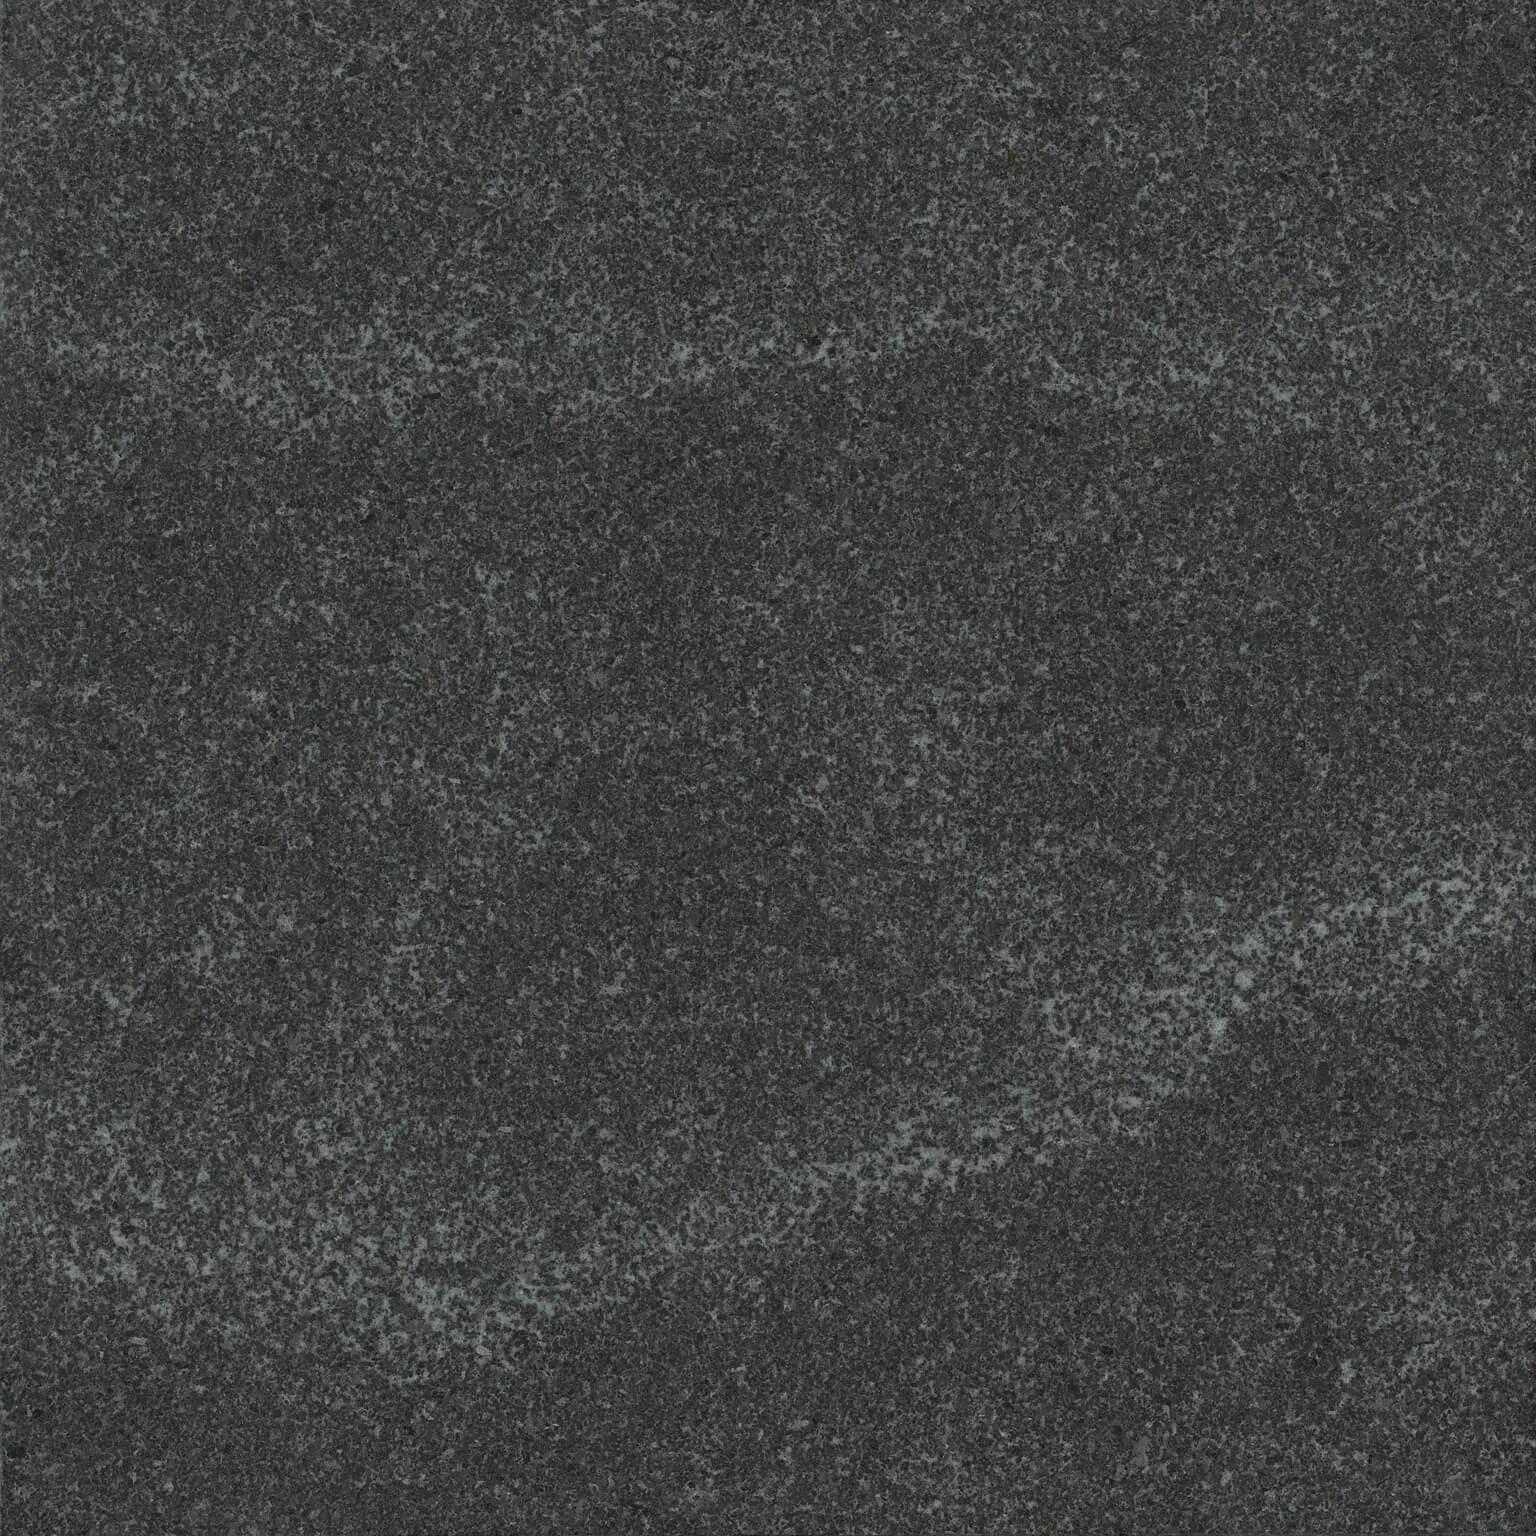 American Mist Structural Stone Llc